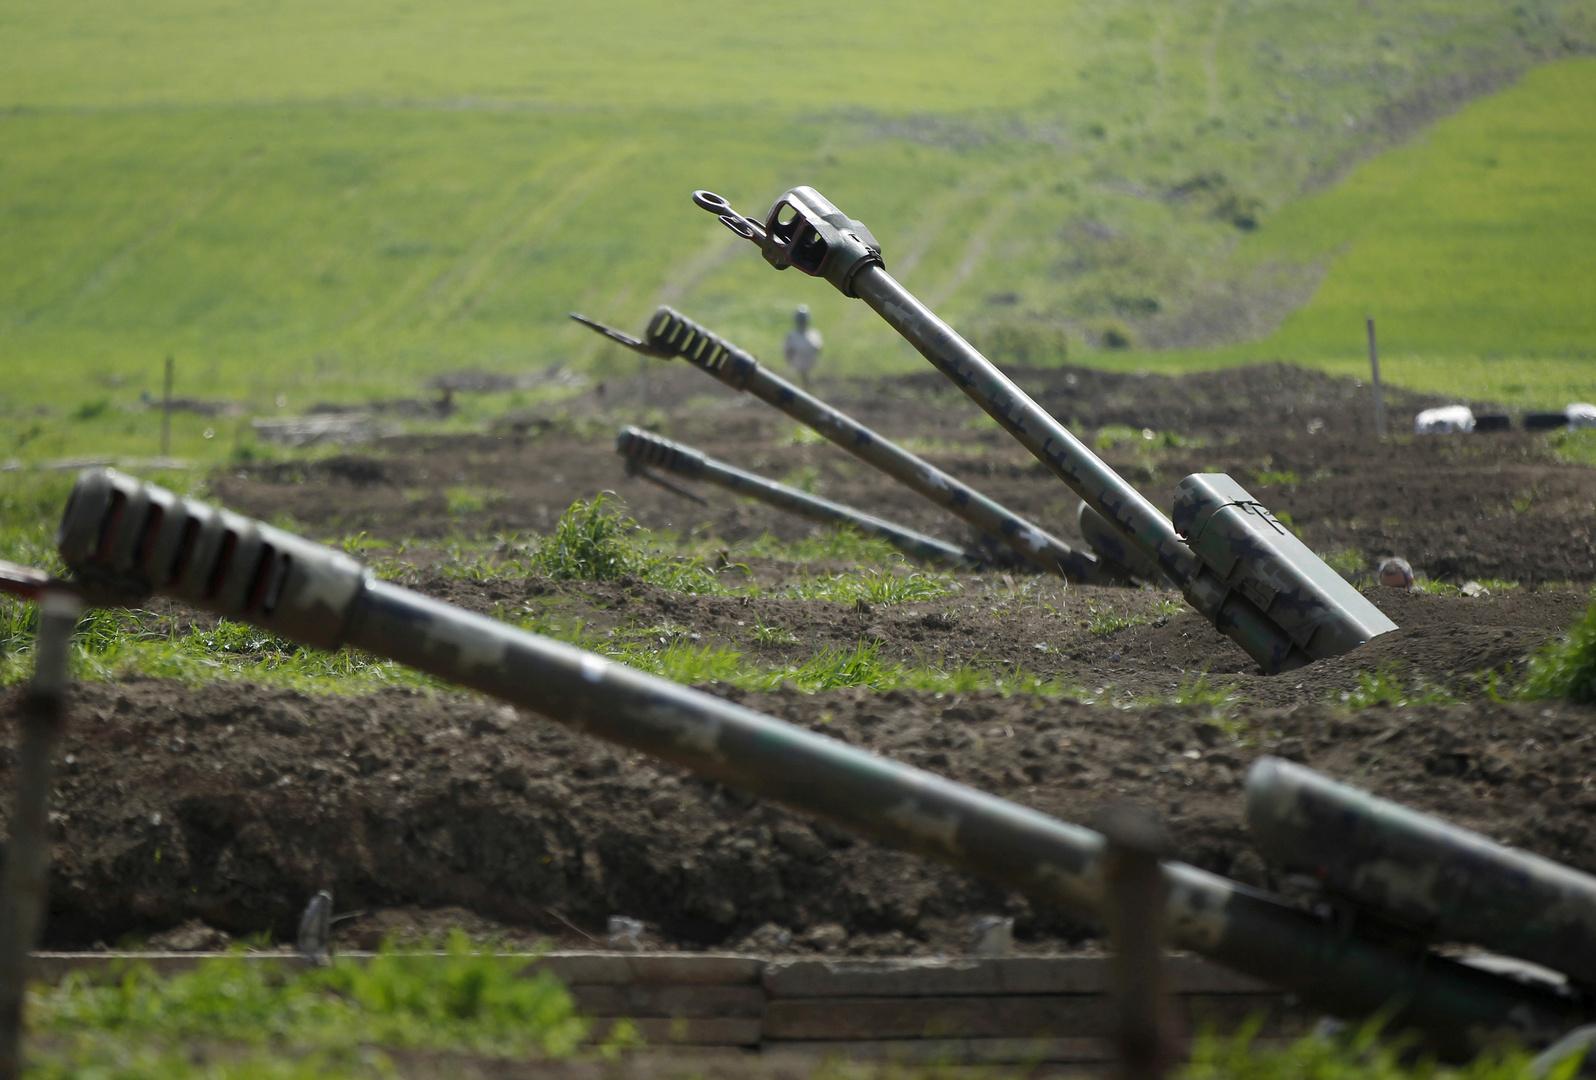 أرمينيا تتهم أذربيجان بحشد قواتها عند حدود إيران وتتوعدها بـ